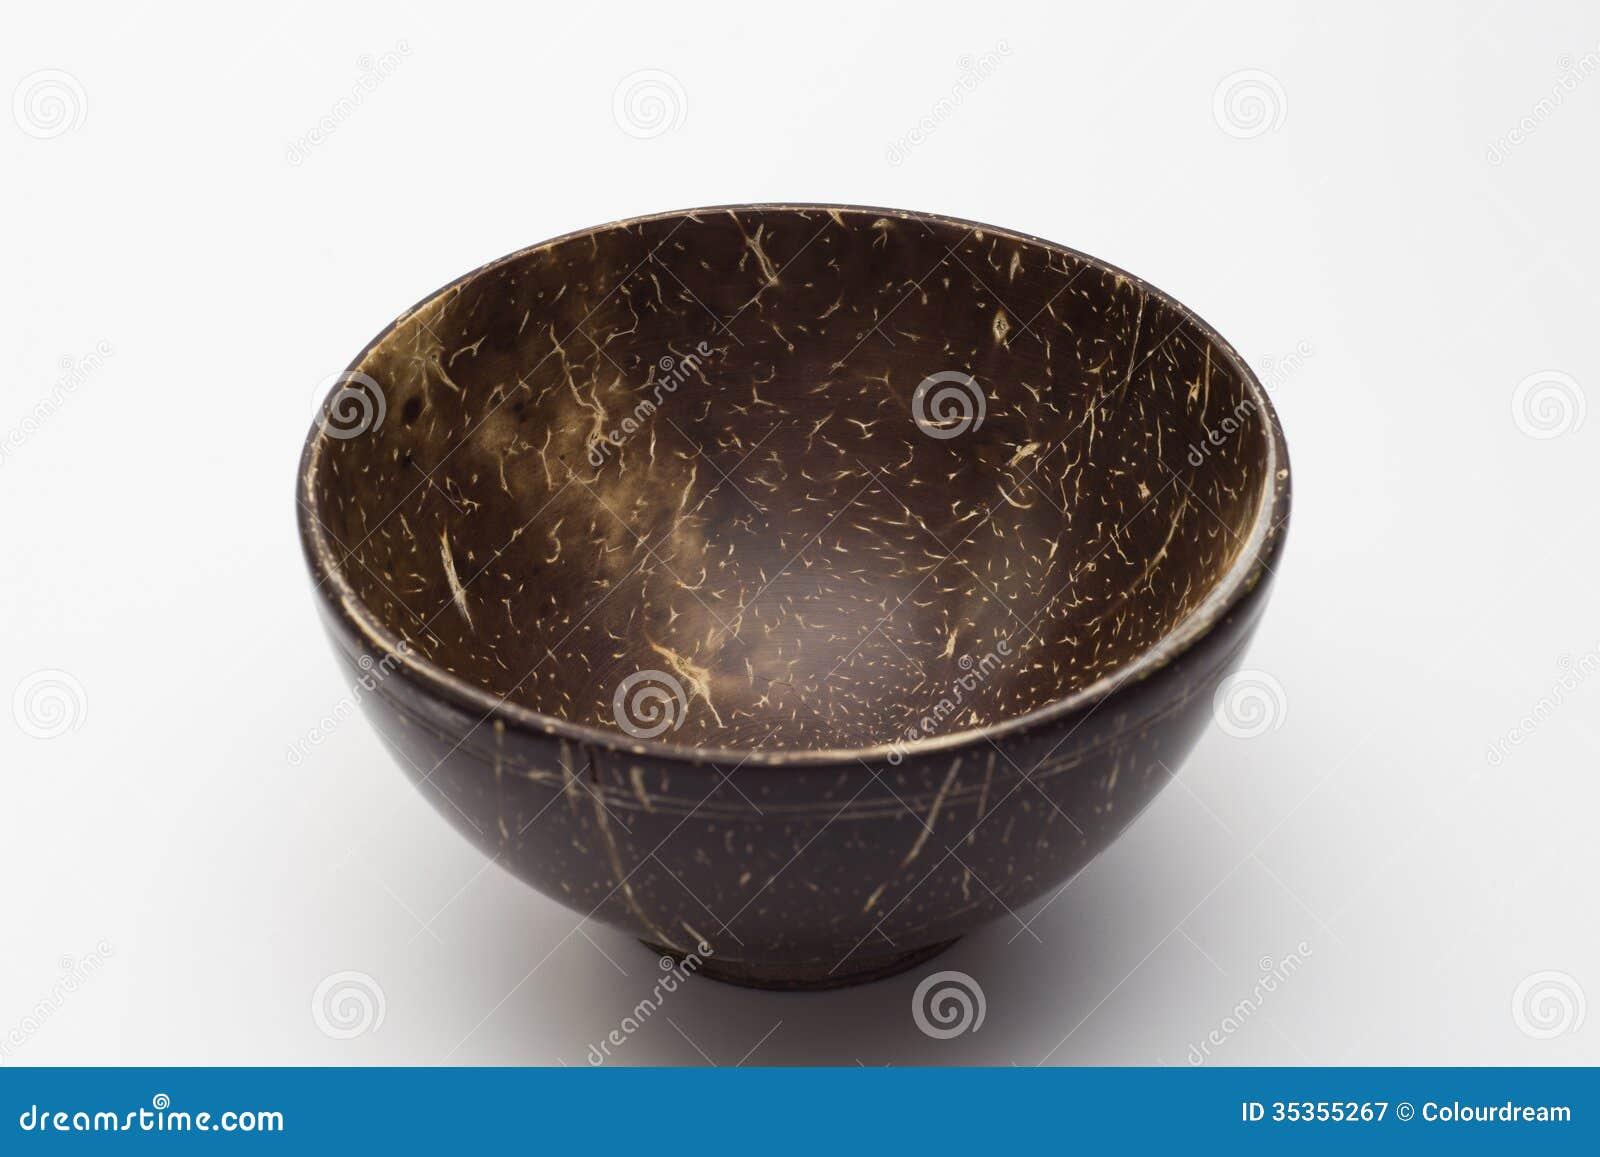 coconut bowls - photo #47